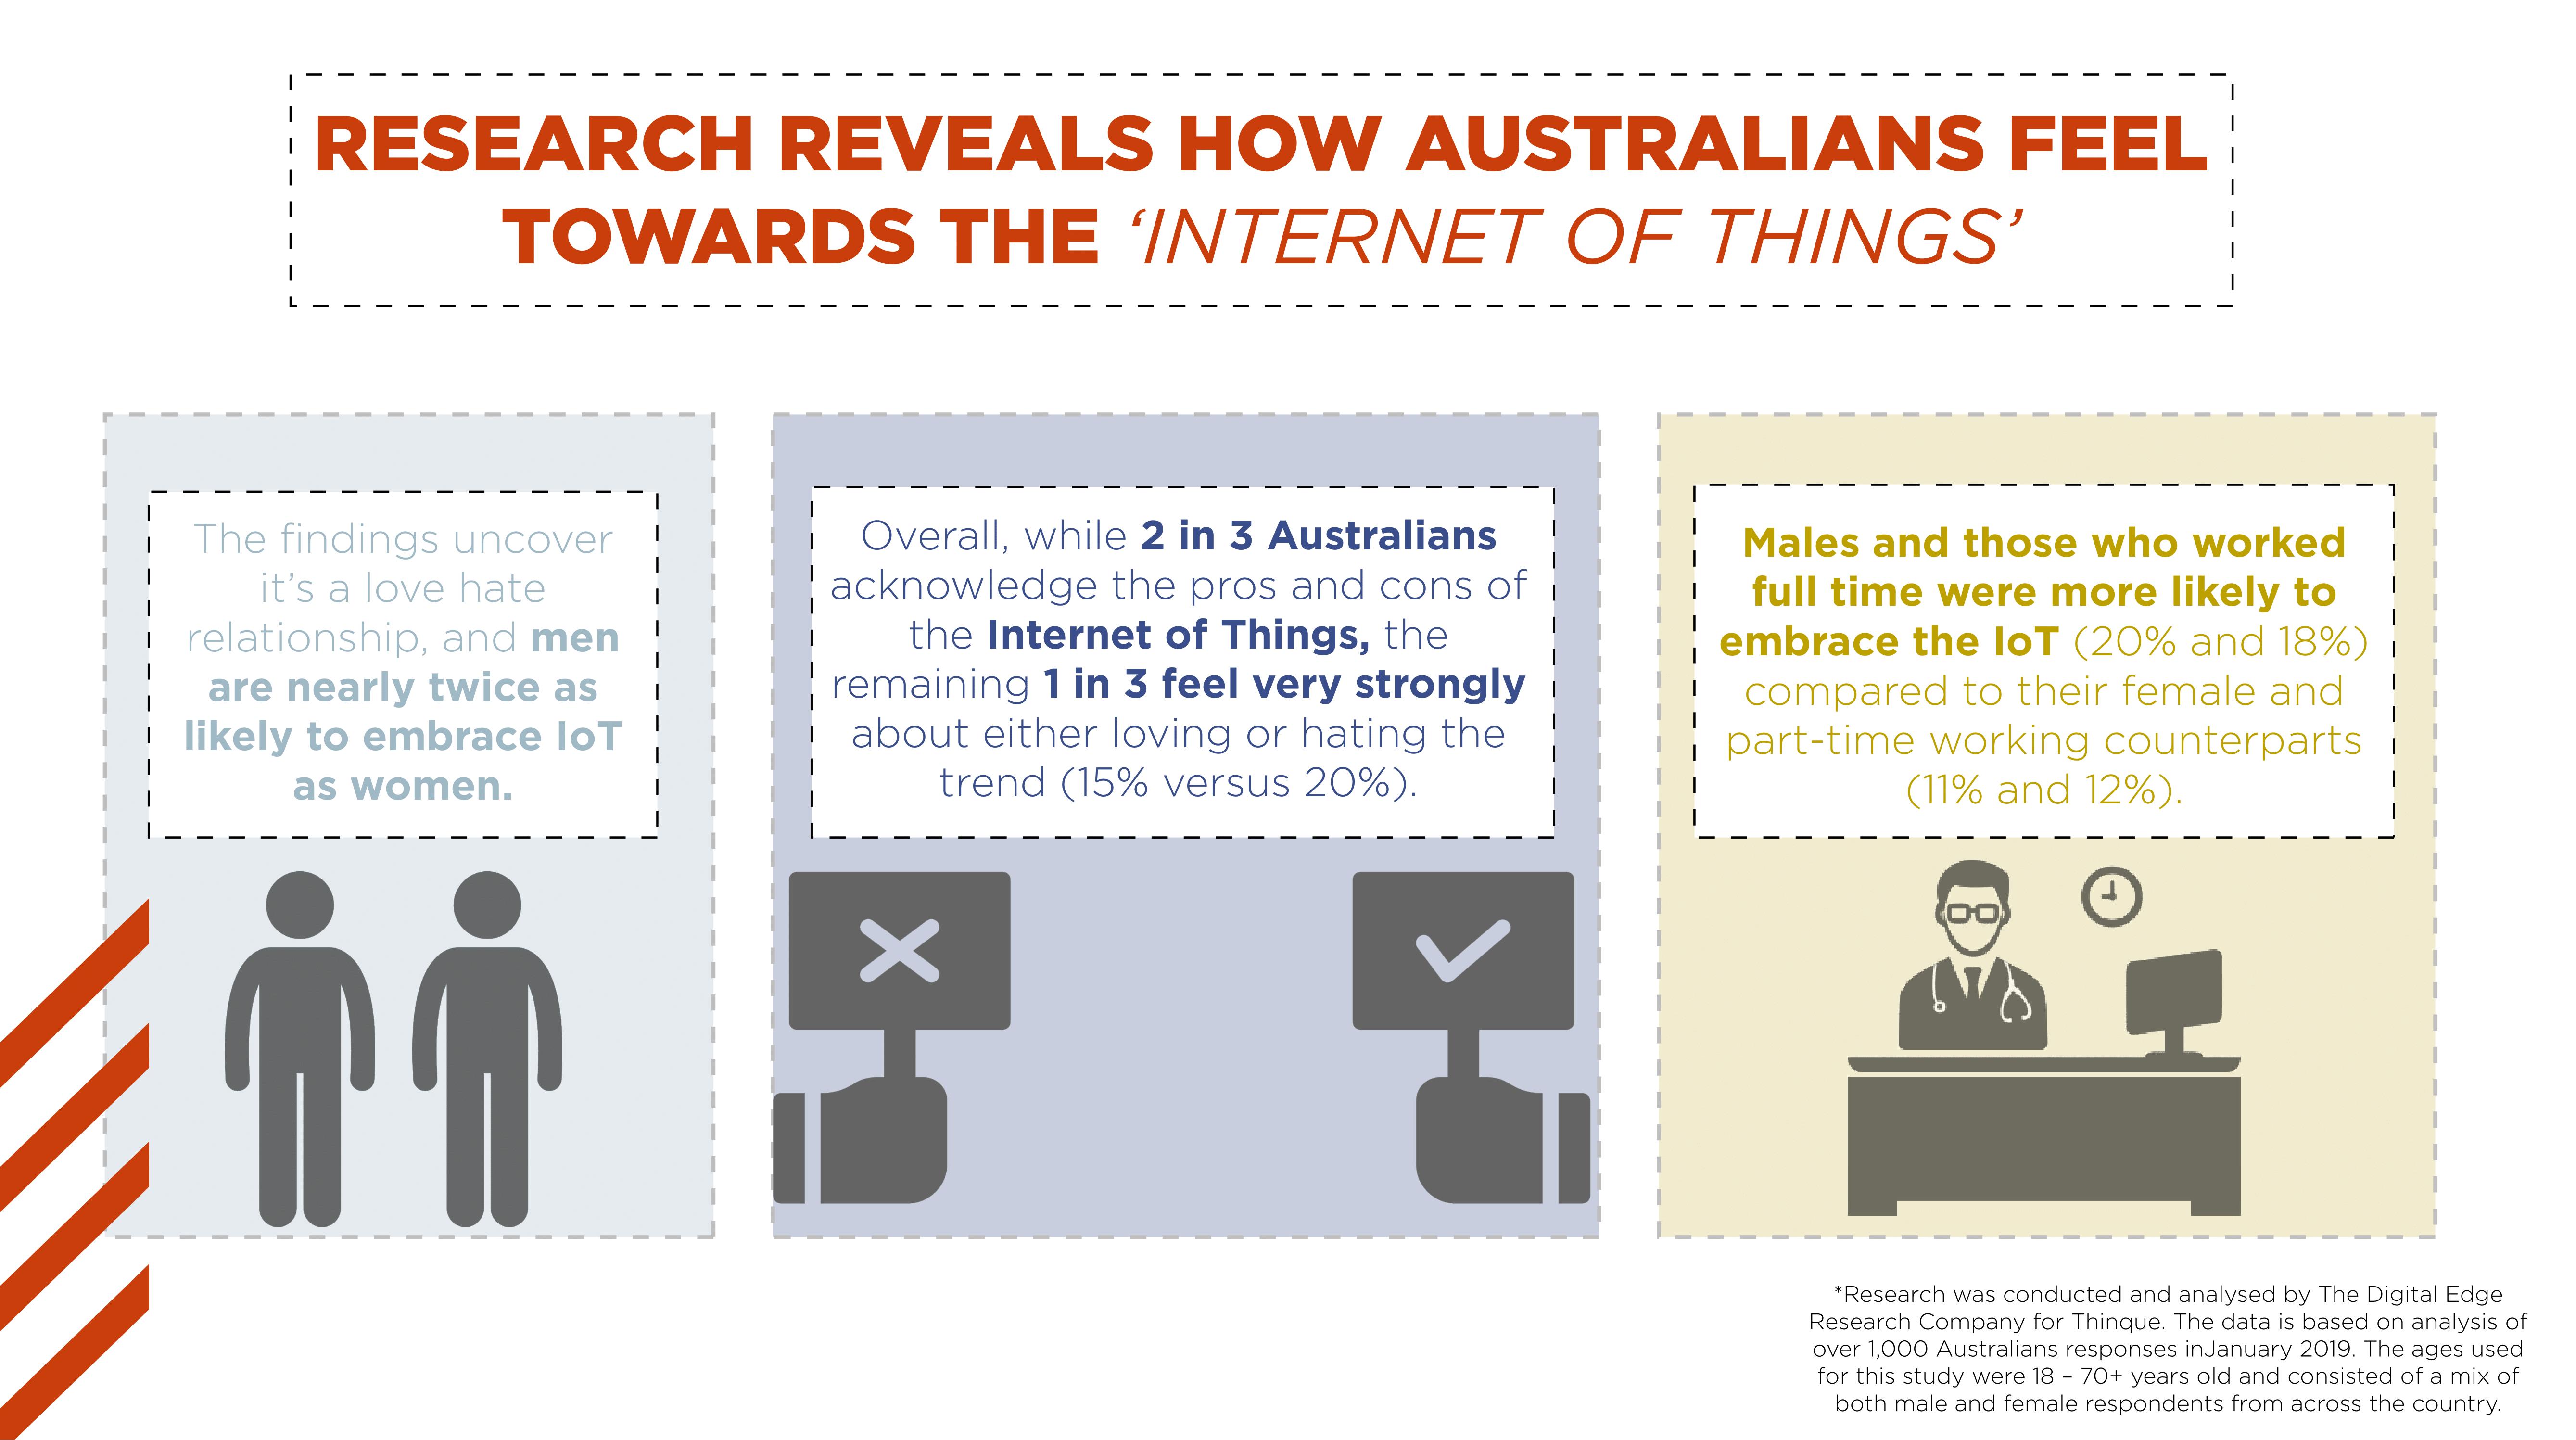 Internet of things 1-1